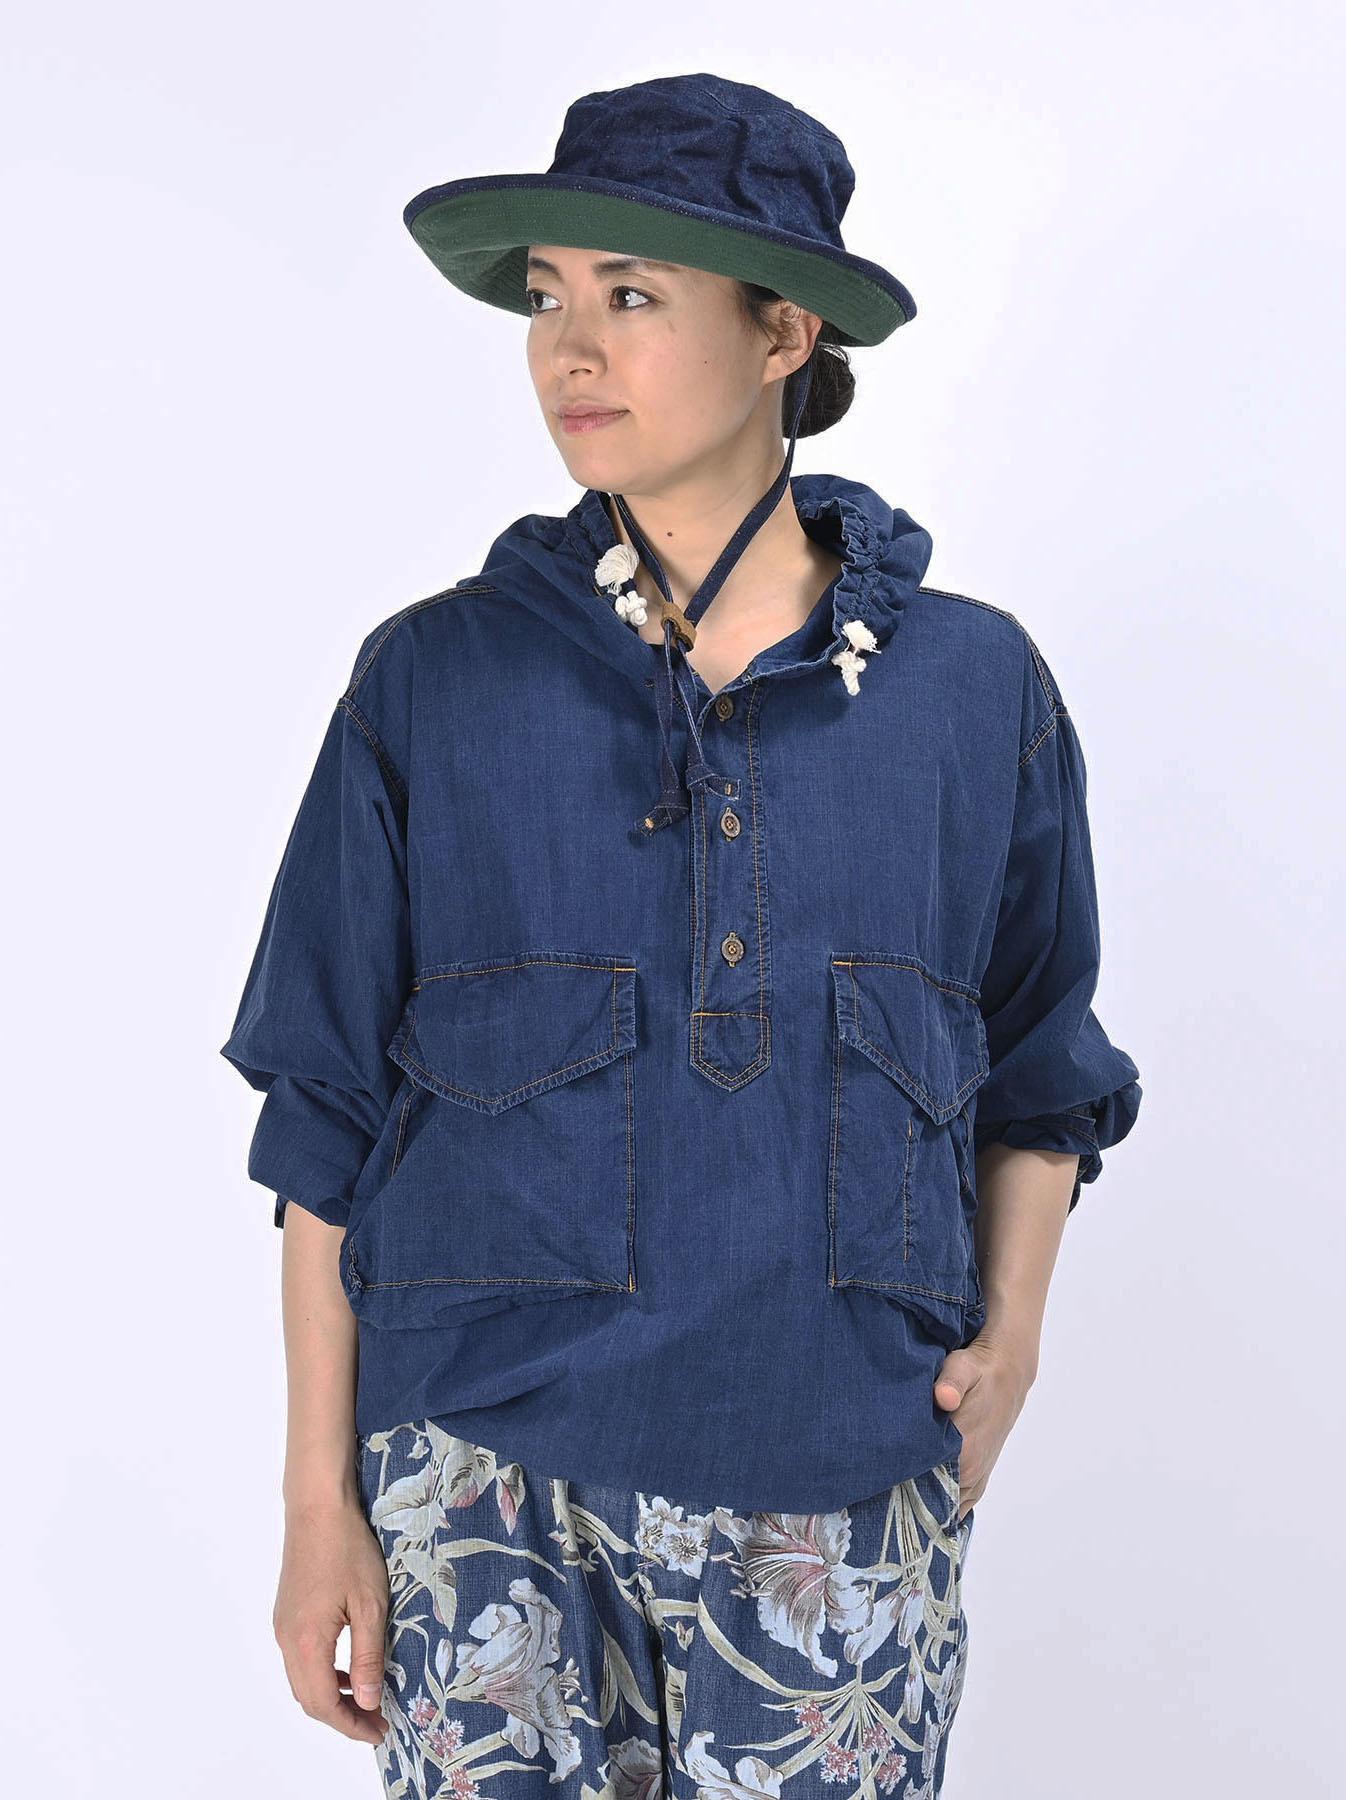 Indigo Tapet Damo Cotton On The Beach Hoodie Shirt-4